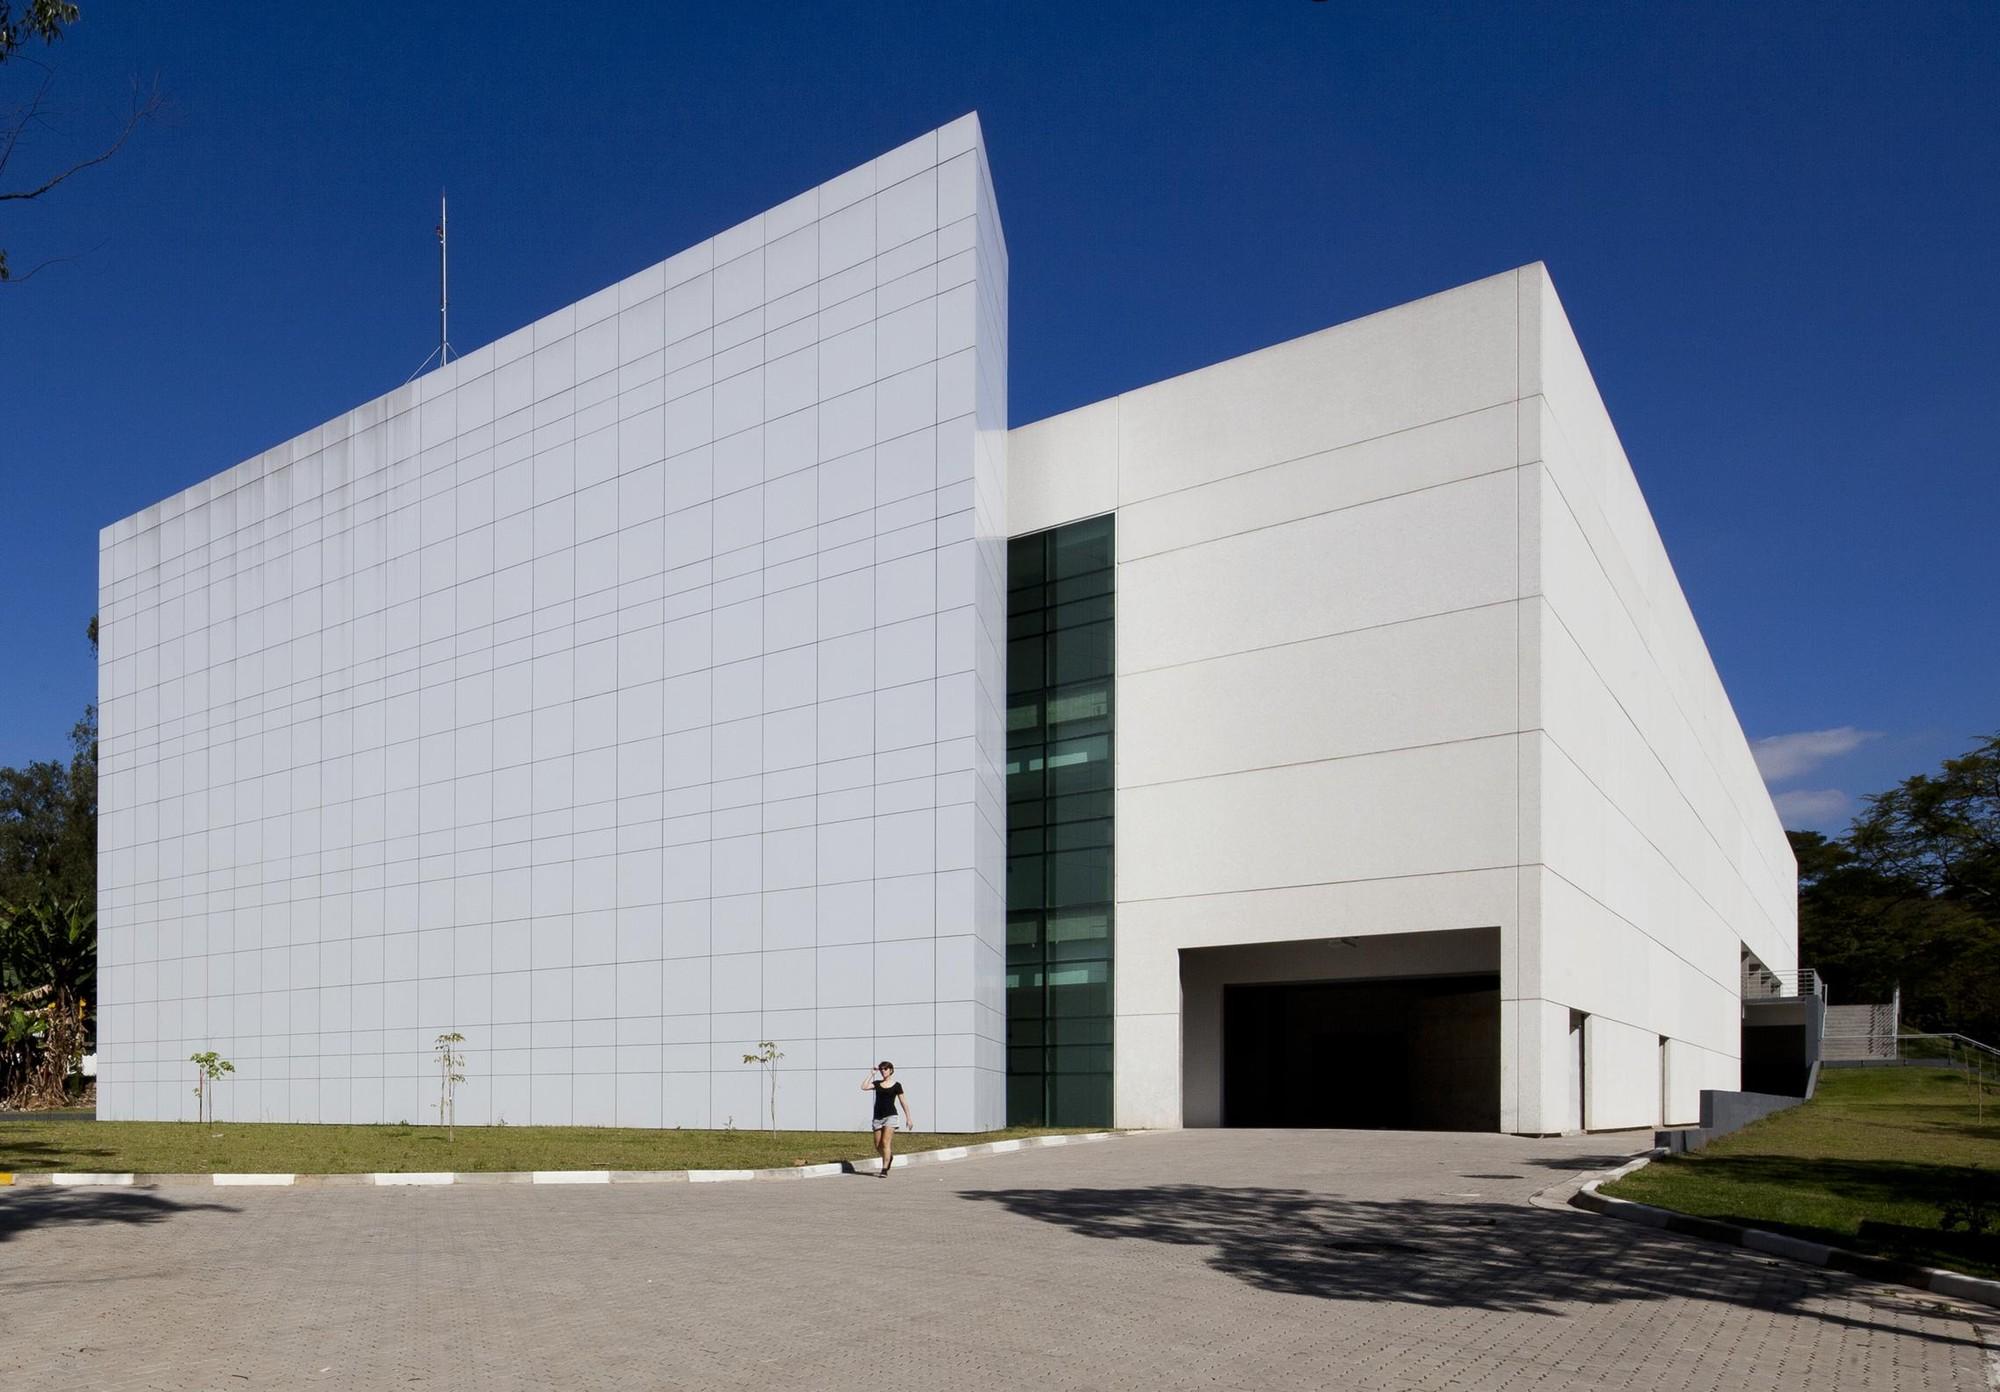 Bio-nanomanufacturing Laboratory / Piratininga Arquitetos Associados + VD Arquitetura, © Maíra Acayaba